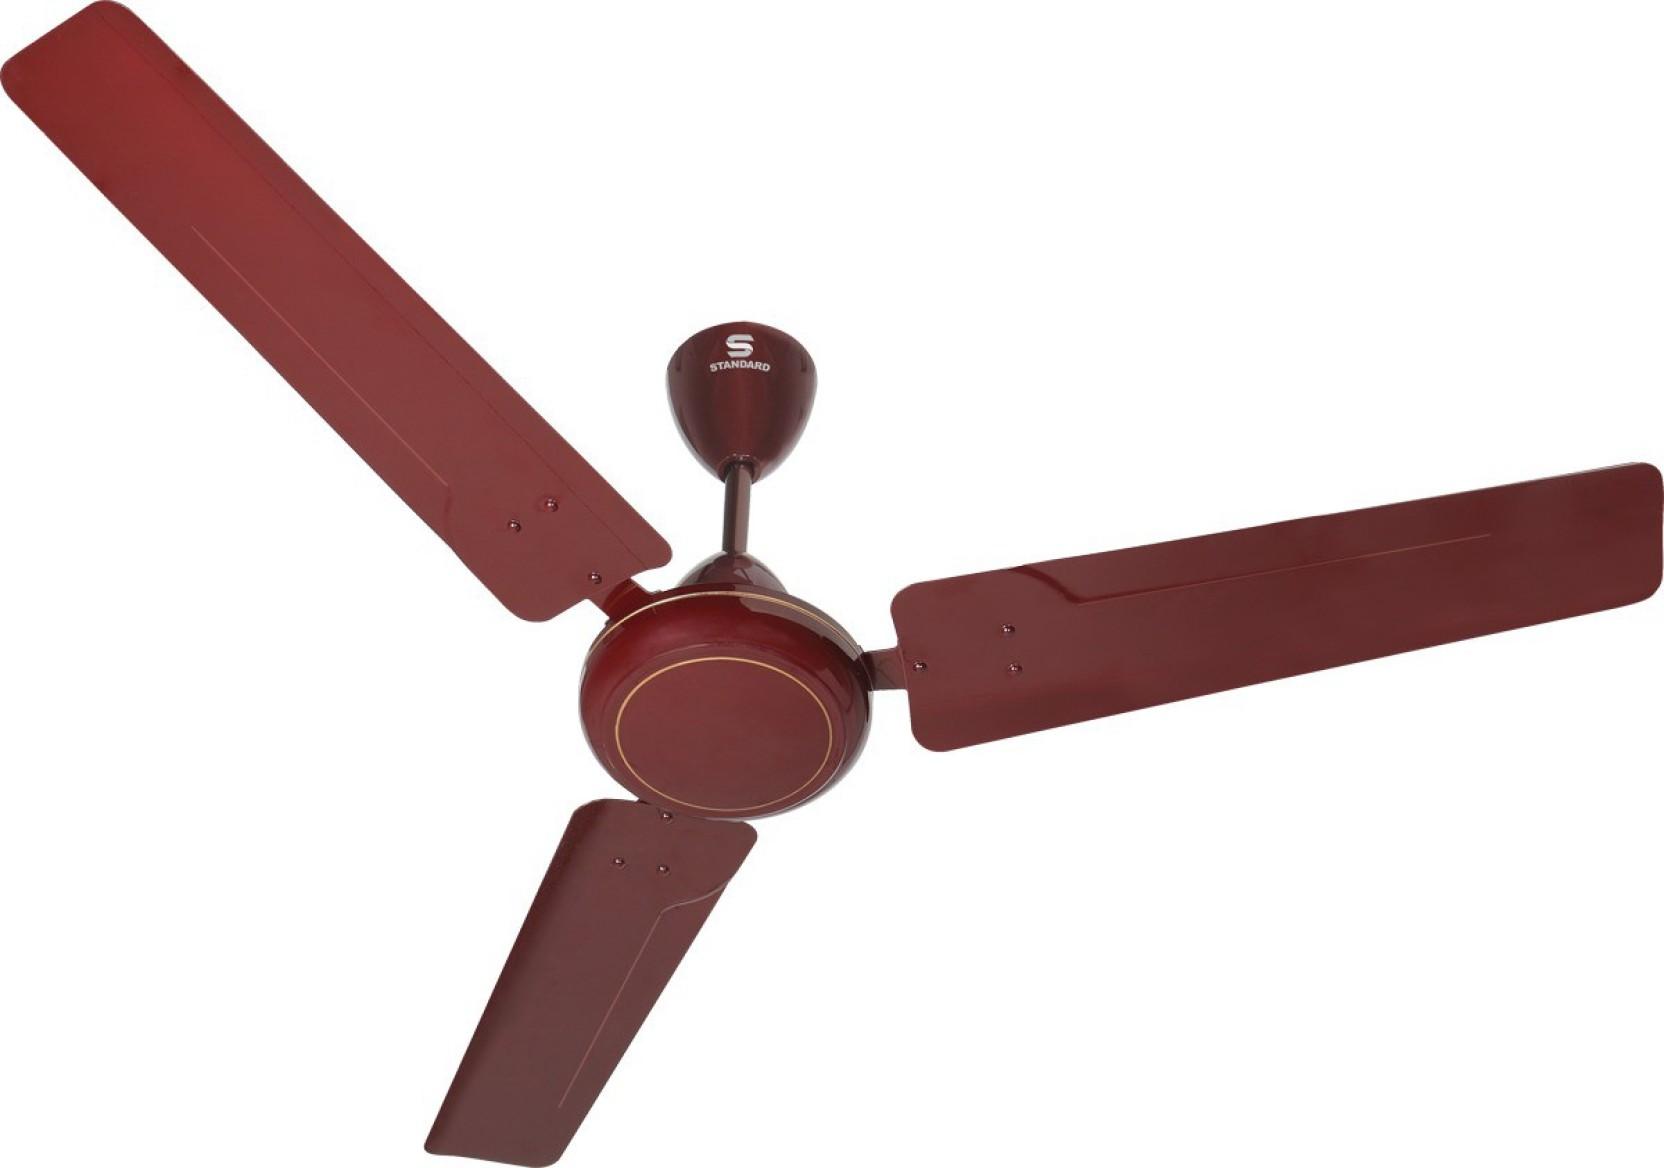 Havells Standard Zinger 3 Blade Ceiling Fan Price in India Buy